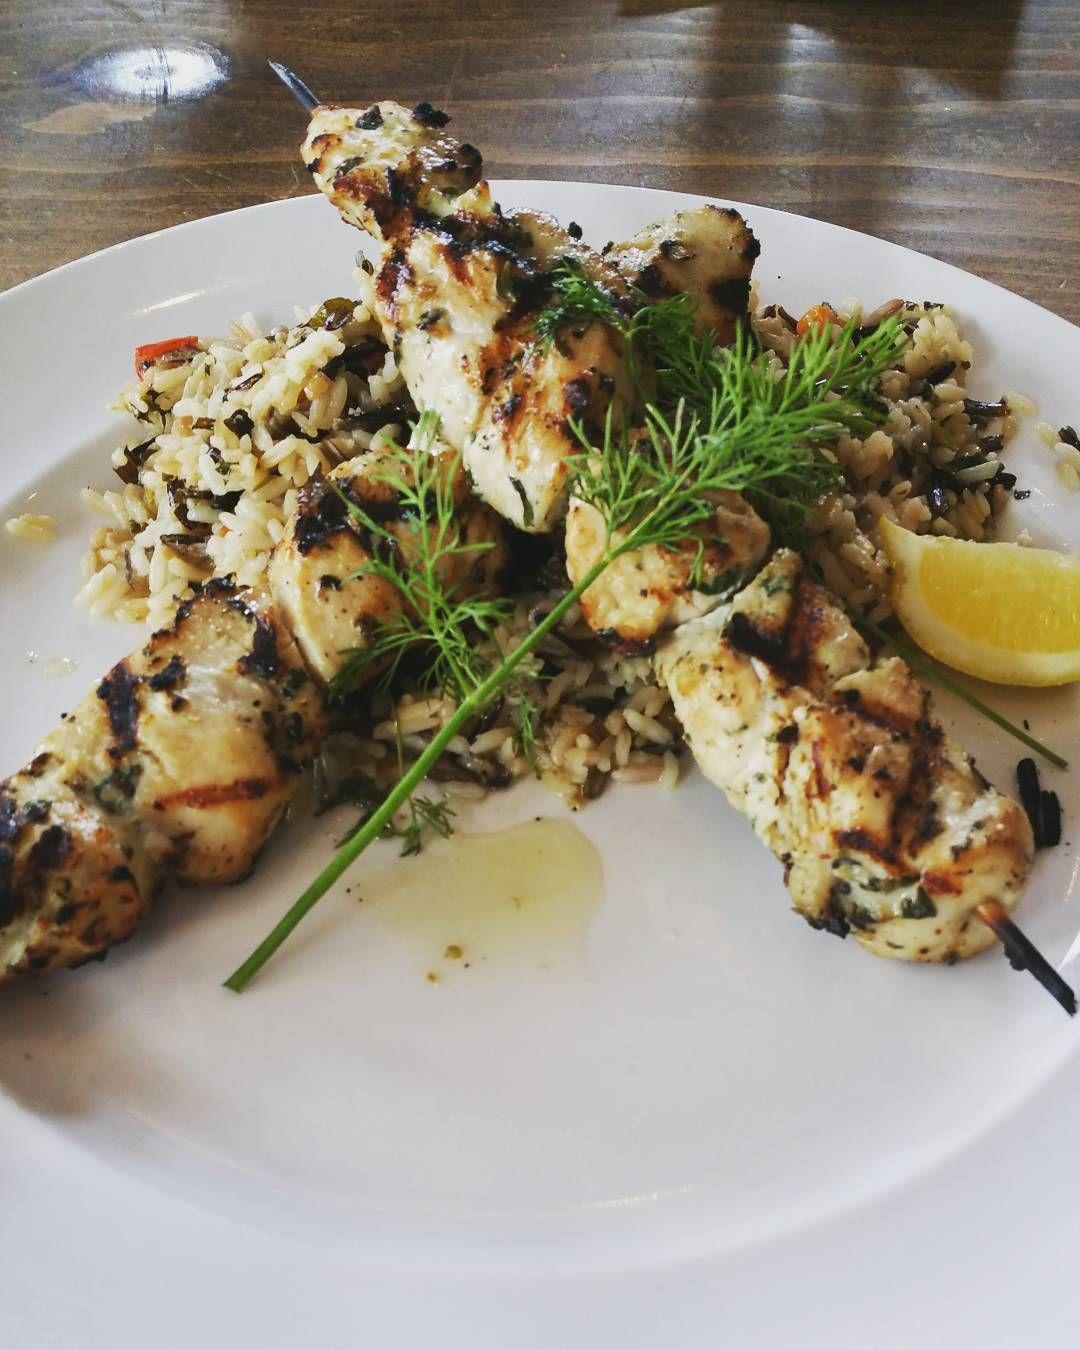 Downtown Campbell: Mmhmmm chicken souvlaki and rice pilaf! #greekfood by tena89